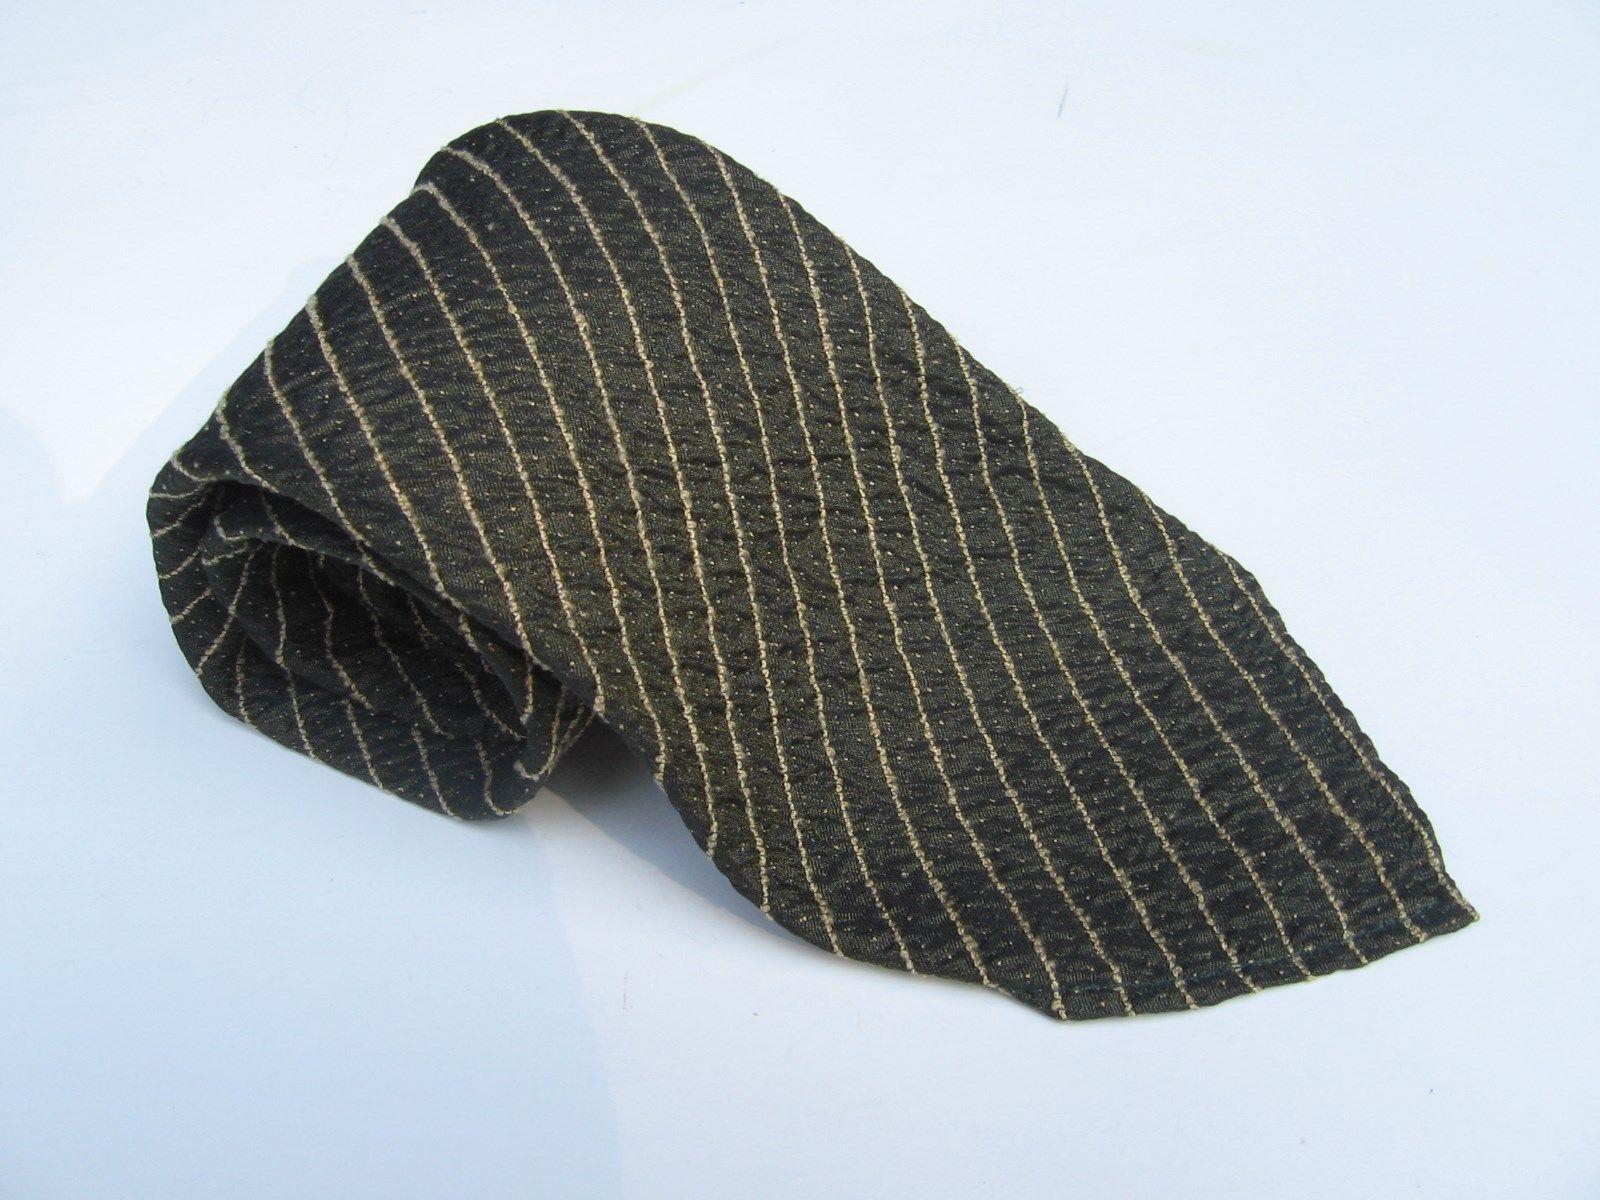 "Giorgio Armani Cravatte Pure Silk Tie Vintage Brown Stripes 61"" Long 31/2"" Wide - $33.85"